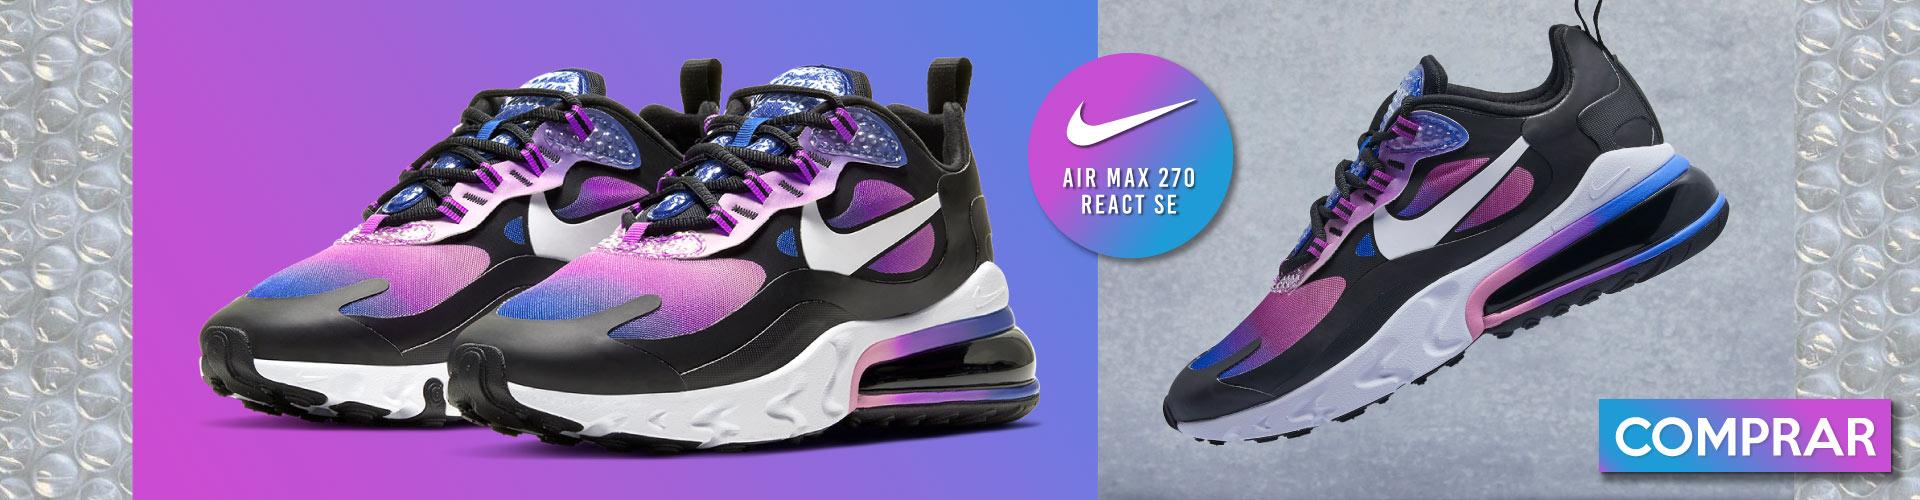 Nike DT